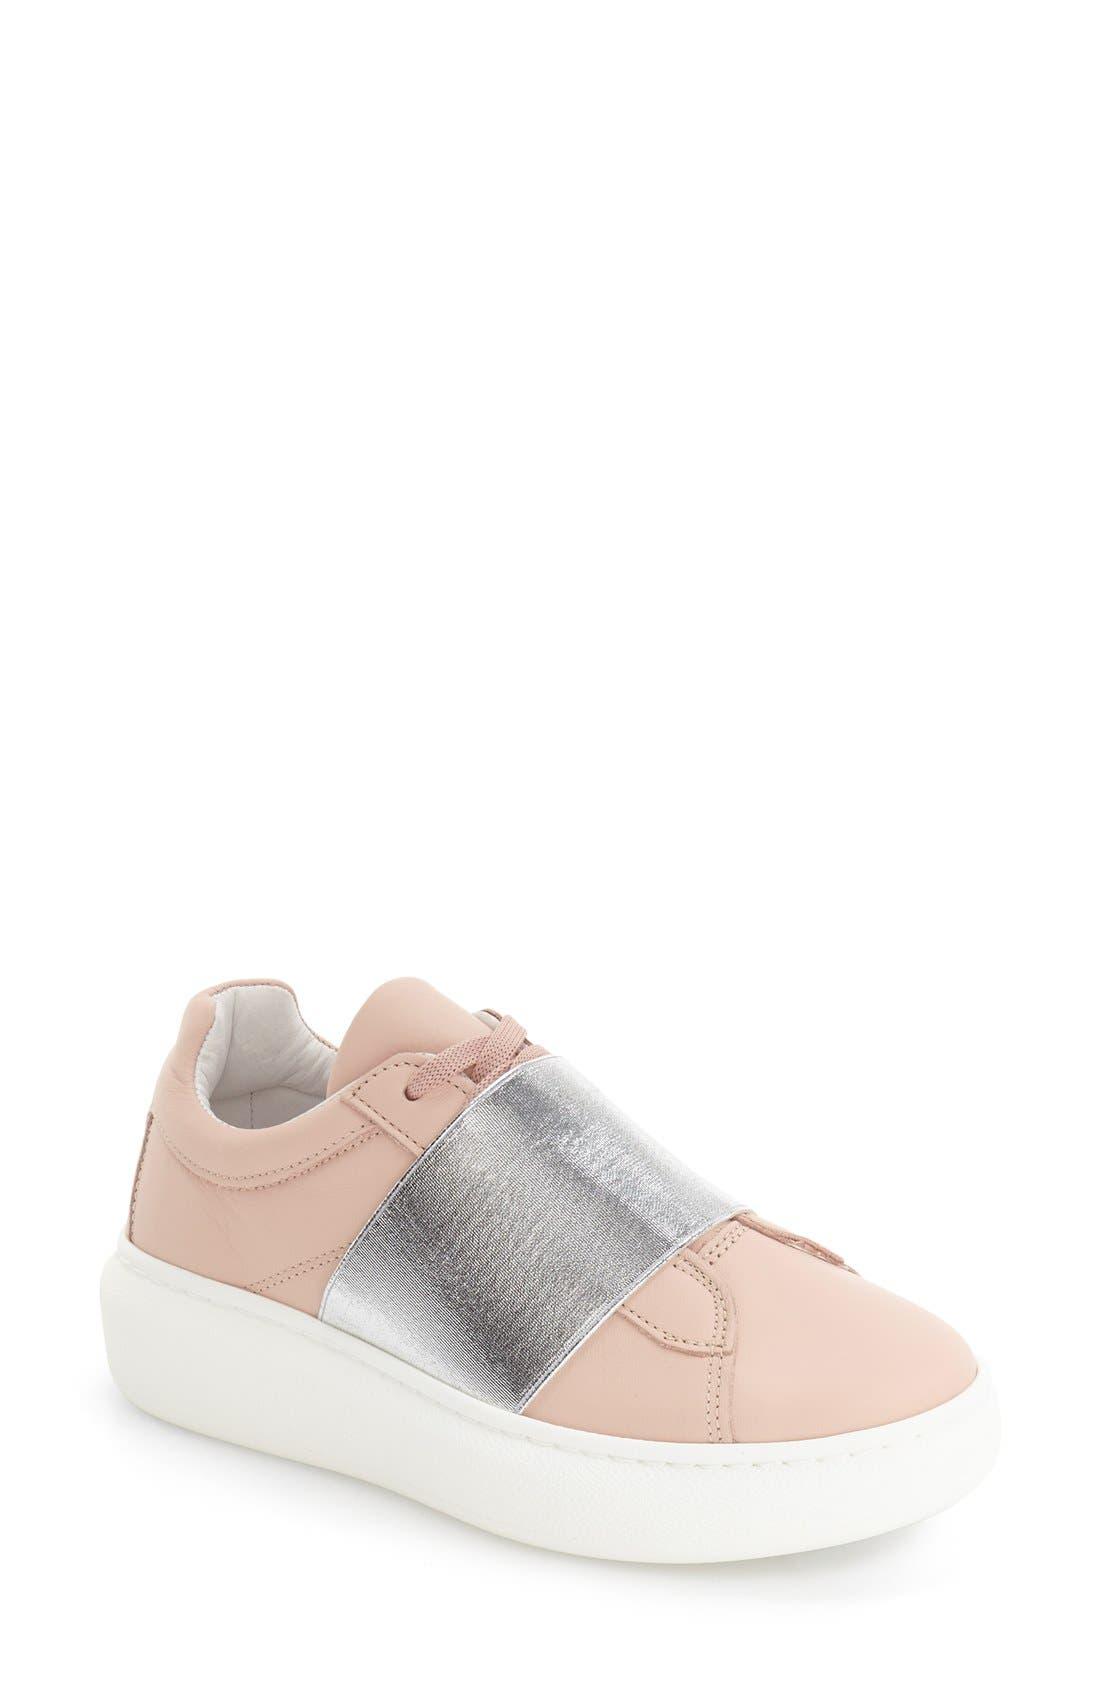 Turin Metallic Strap Platform Sneaker,                             Main thumbnail 1, color,                             650